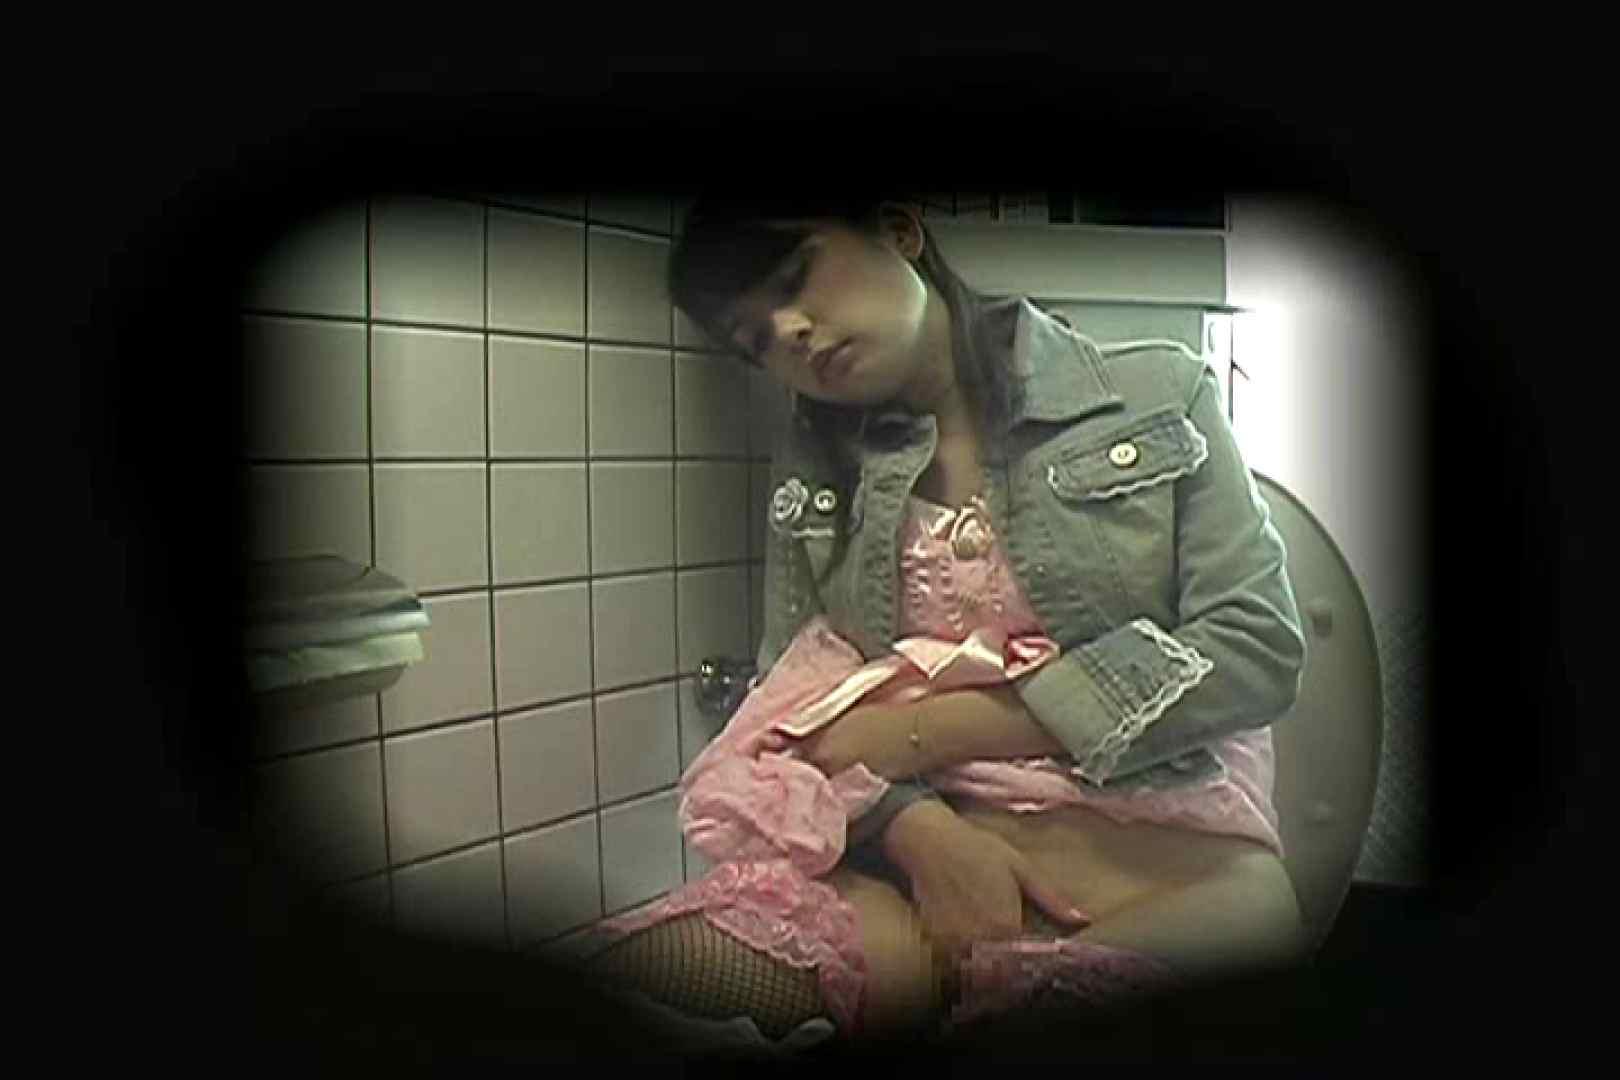 自慰天国女子洗面所Vol.6 喘ぎ エロ画像 77画像 3